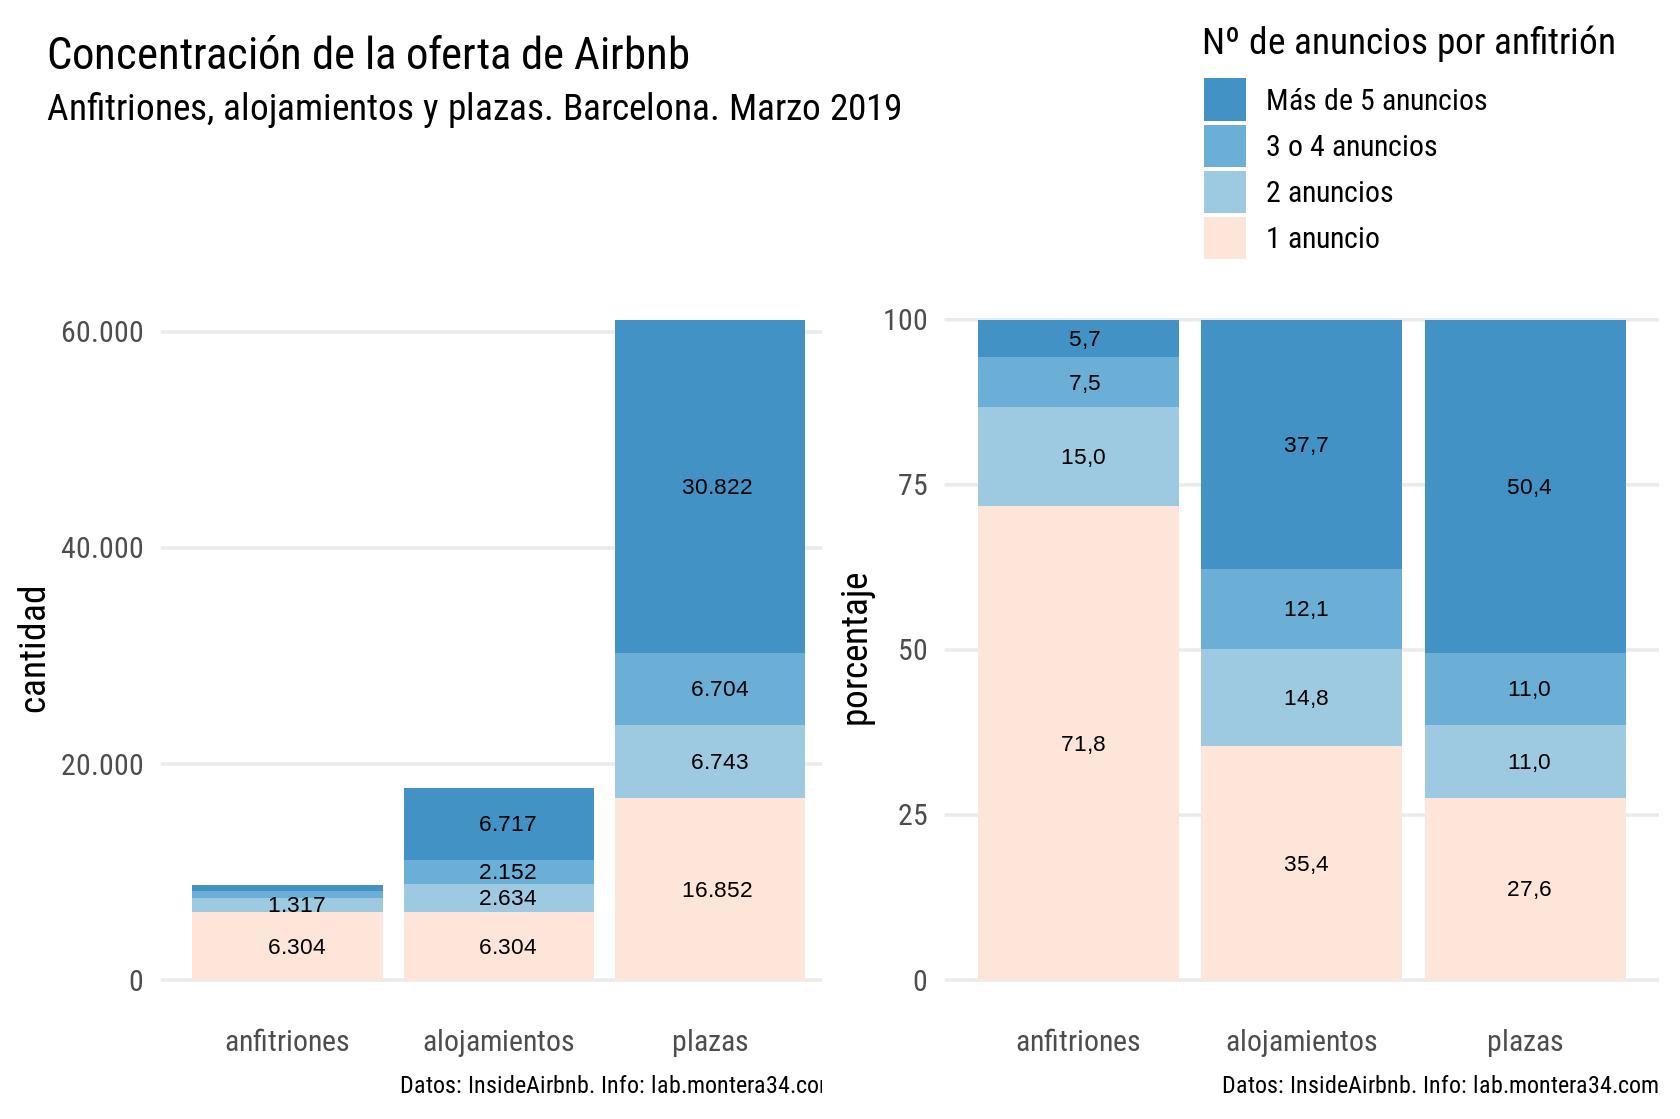 static/images/barcelona/hosts/concentracion-oferta-airbnb-barcelona-201903_resumen.png